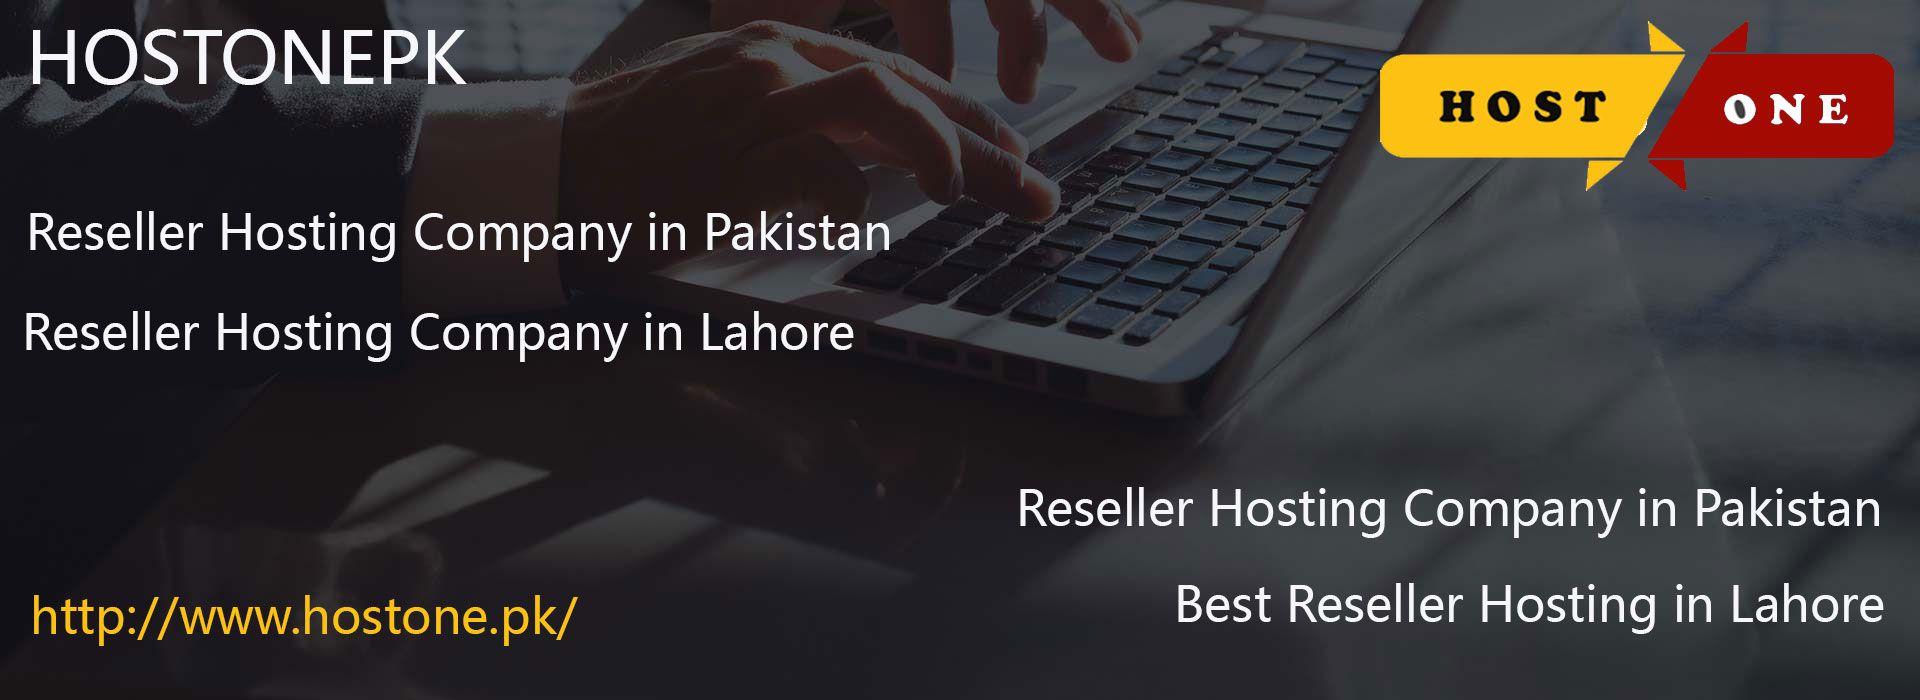 hostonepk now delivering best services of reseller hosting in pakistan our reseller hosting services include